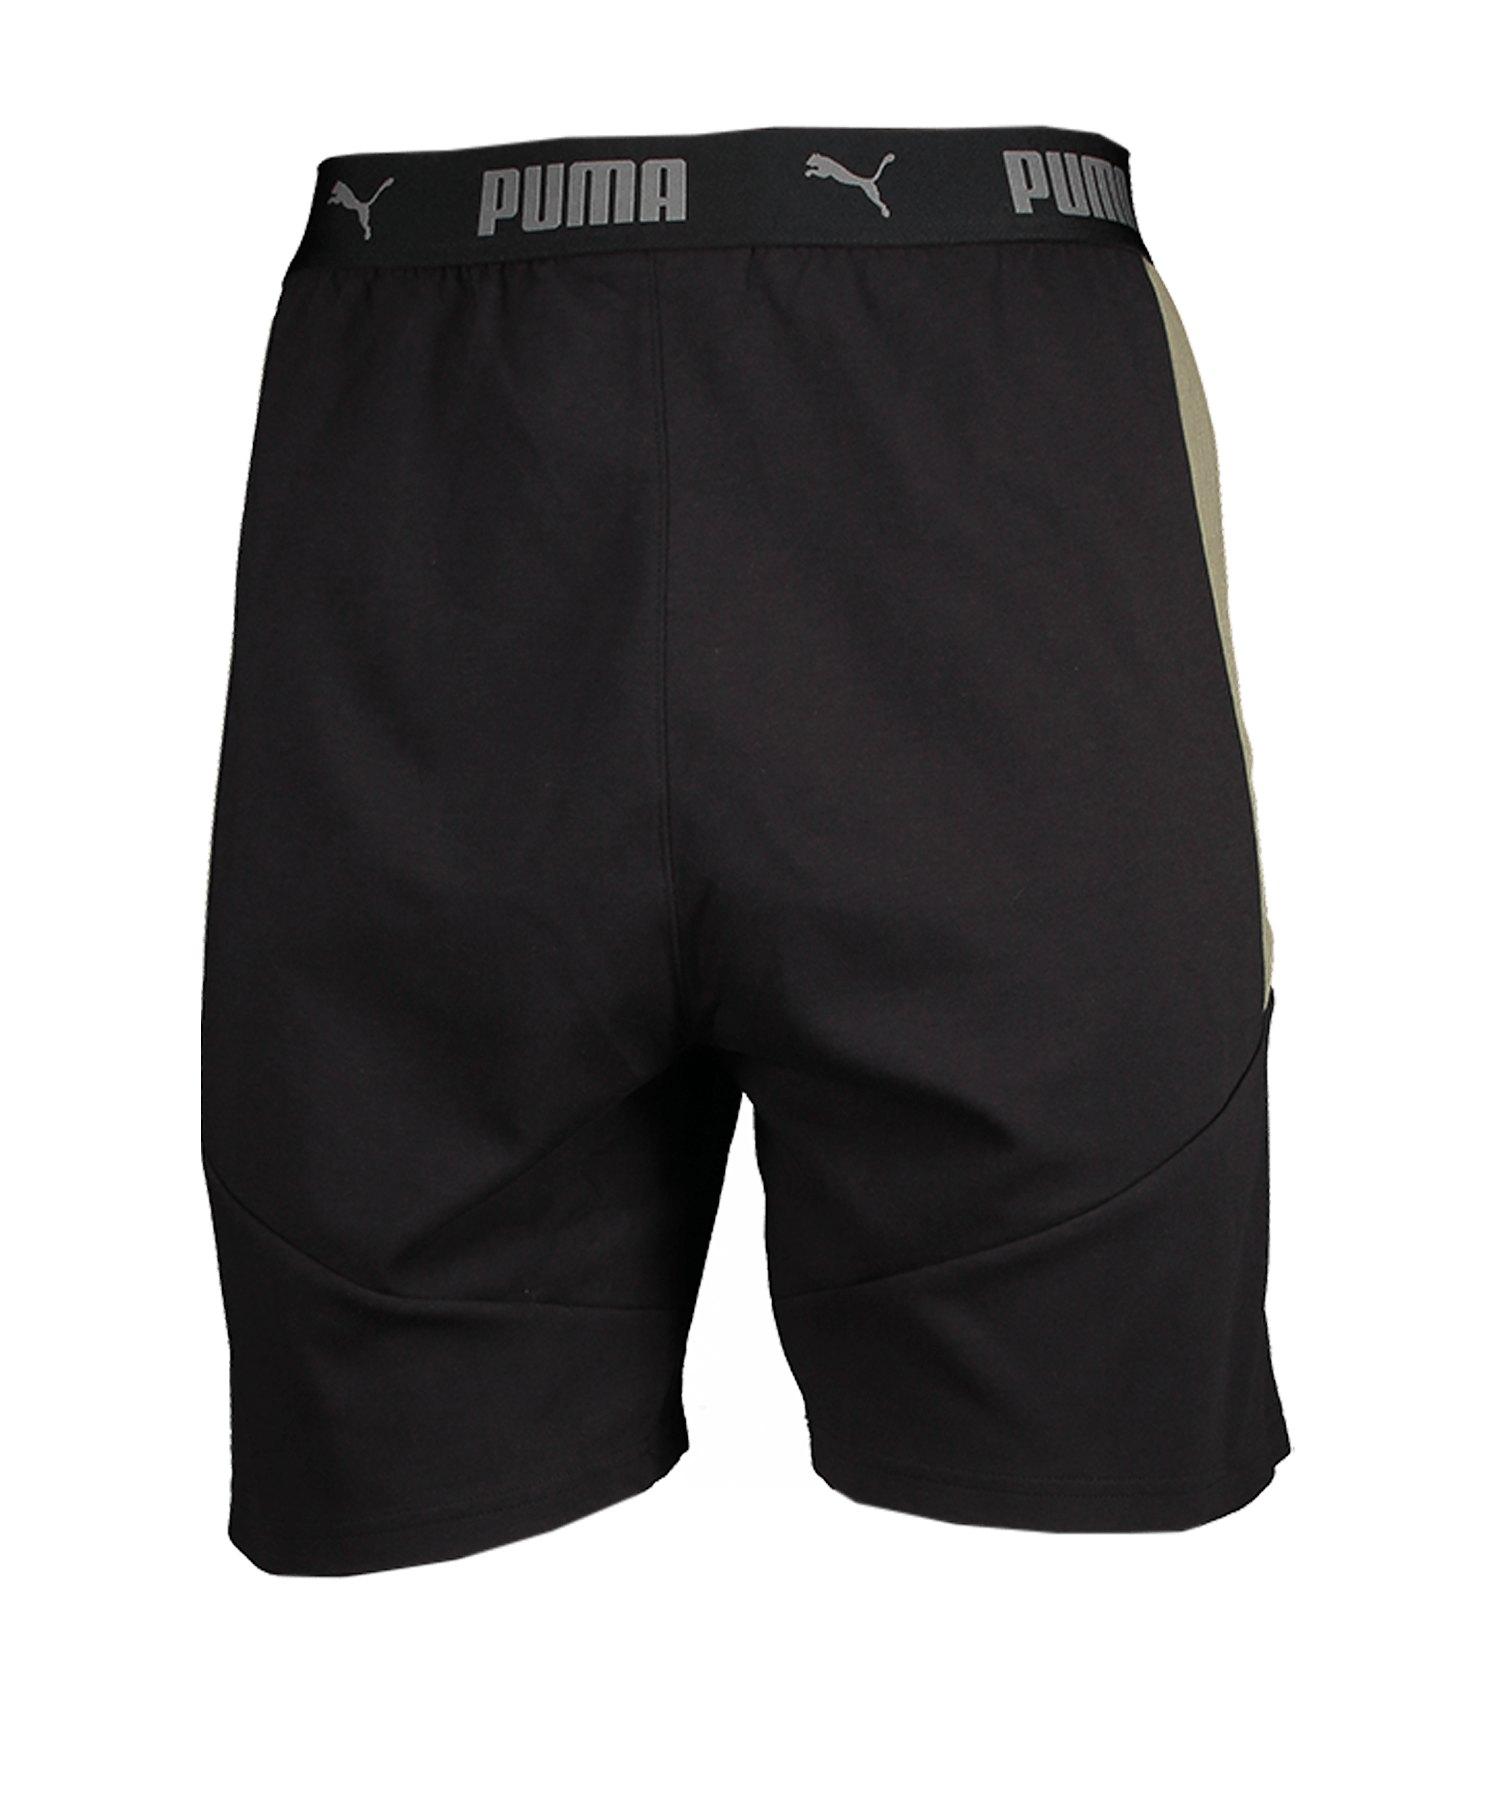 PUMA PUMA ftblNXT Casuals Short Schwarz F05 - schwarz